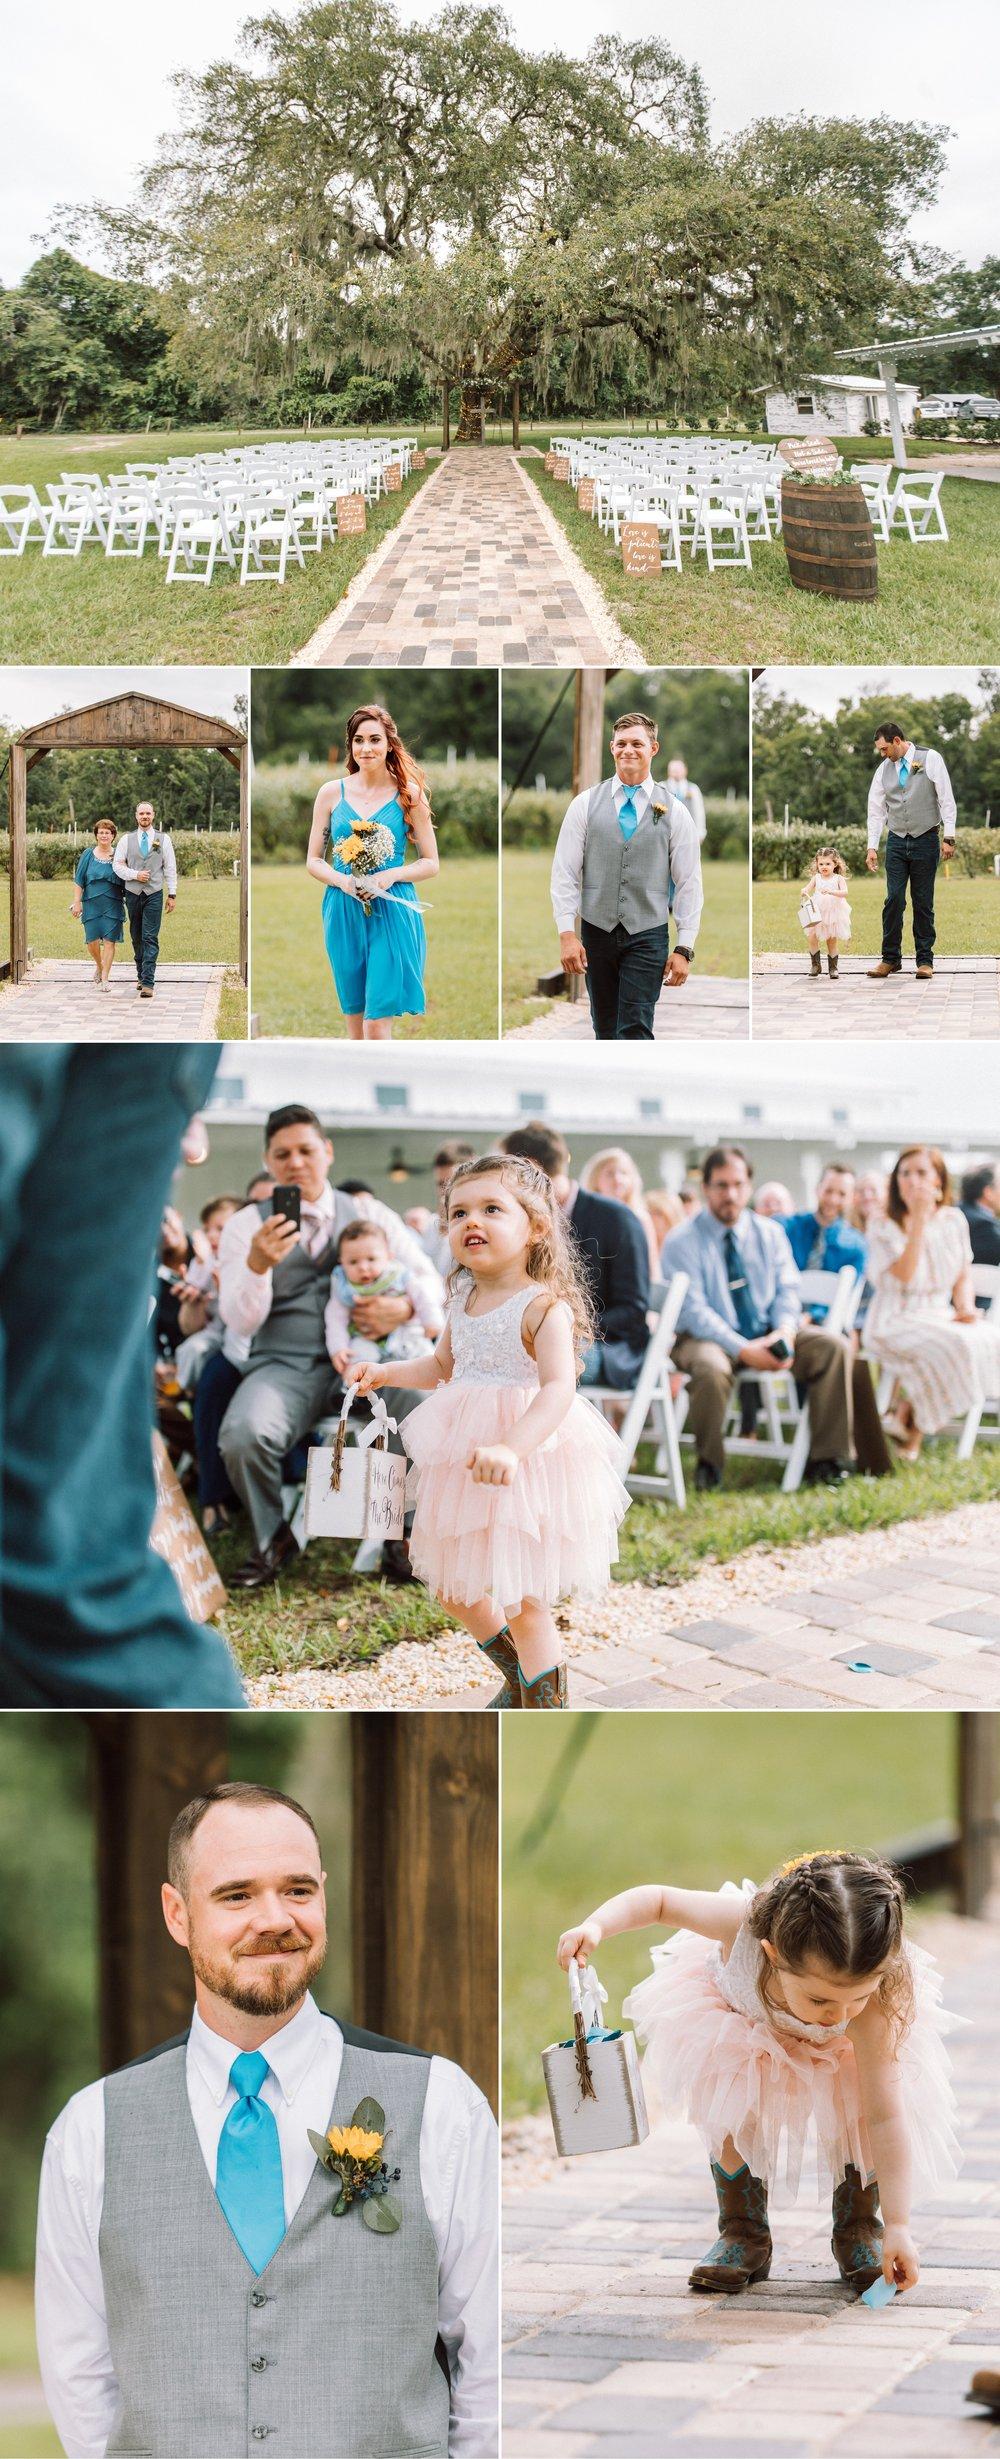 Rustic Sunflower & Blueberry Barn Wedding- Ever After Farms - Allie & NickBlog 15.jpg